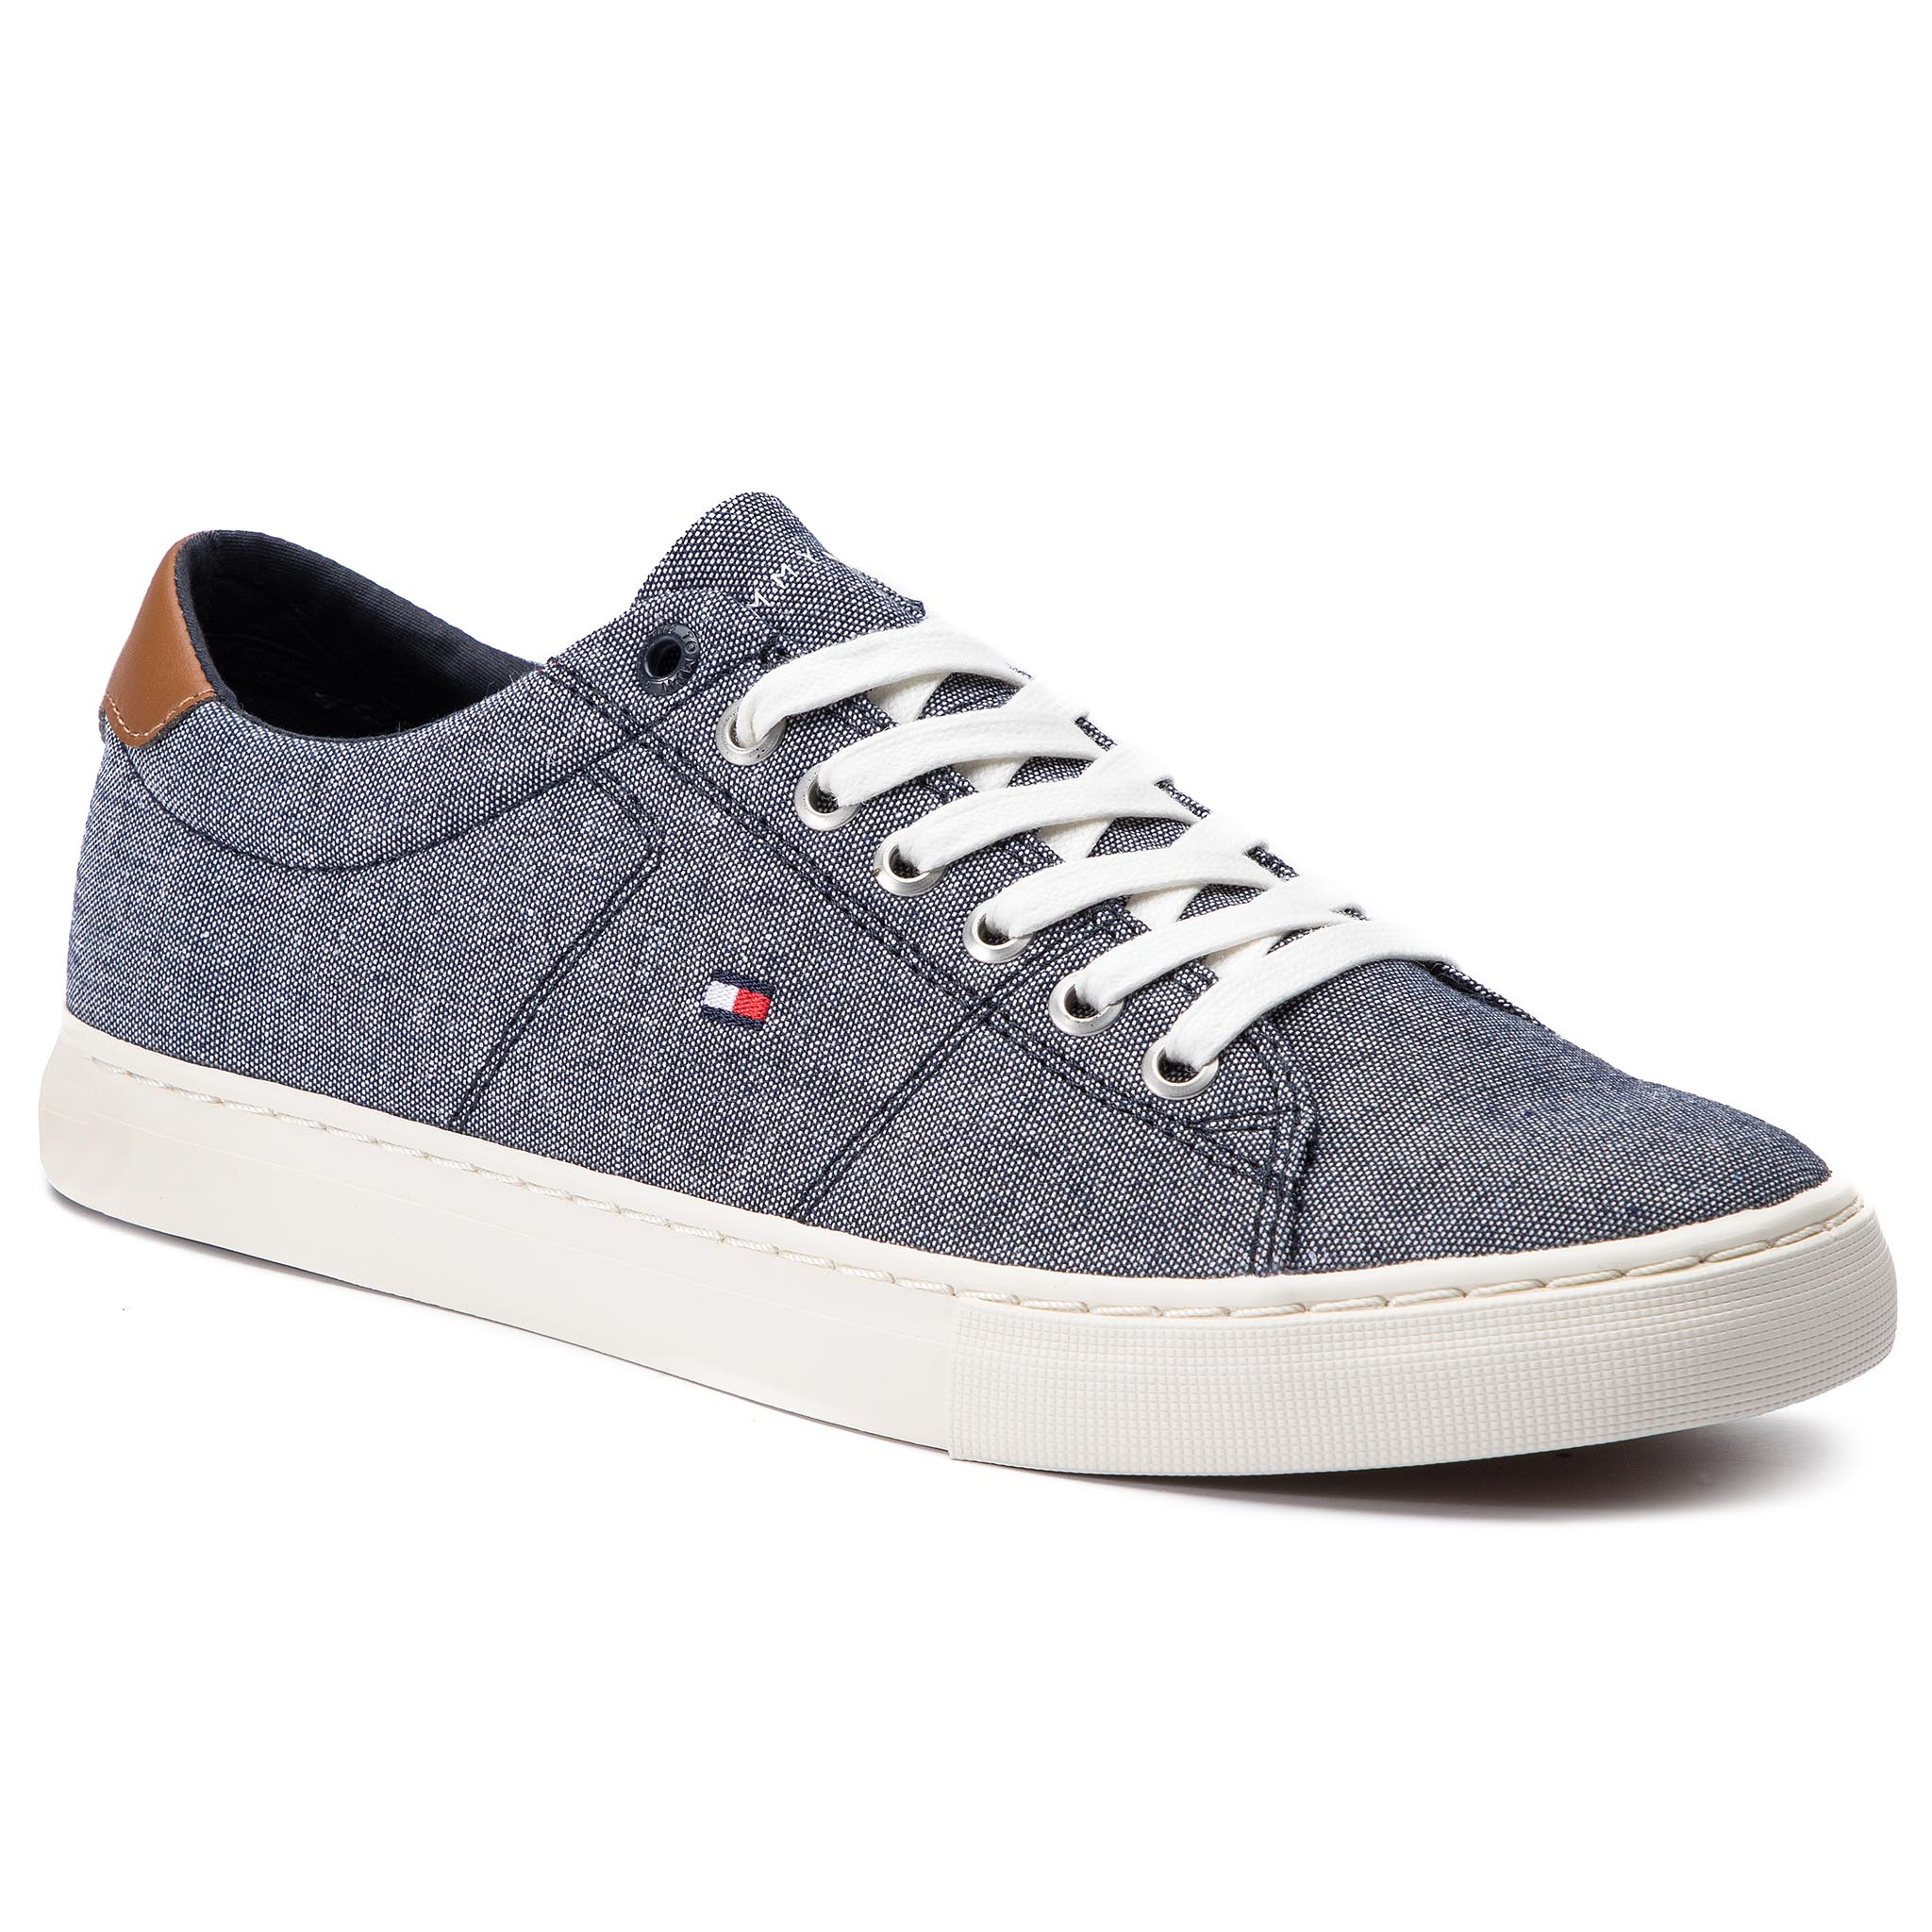 0bf8688970 Teniszcipő TOMMY HILFIGER - Seasonal Textile Sneaker FM0FM02204 ...